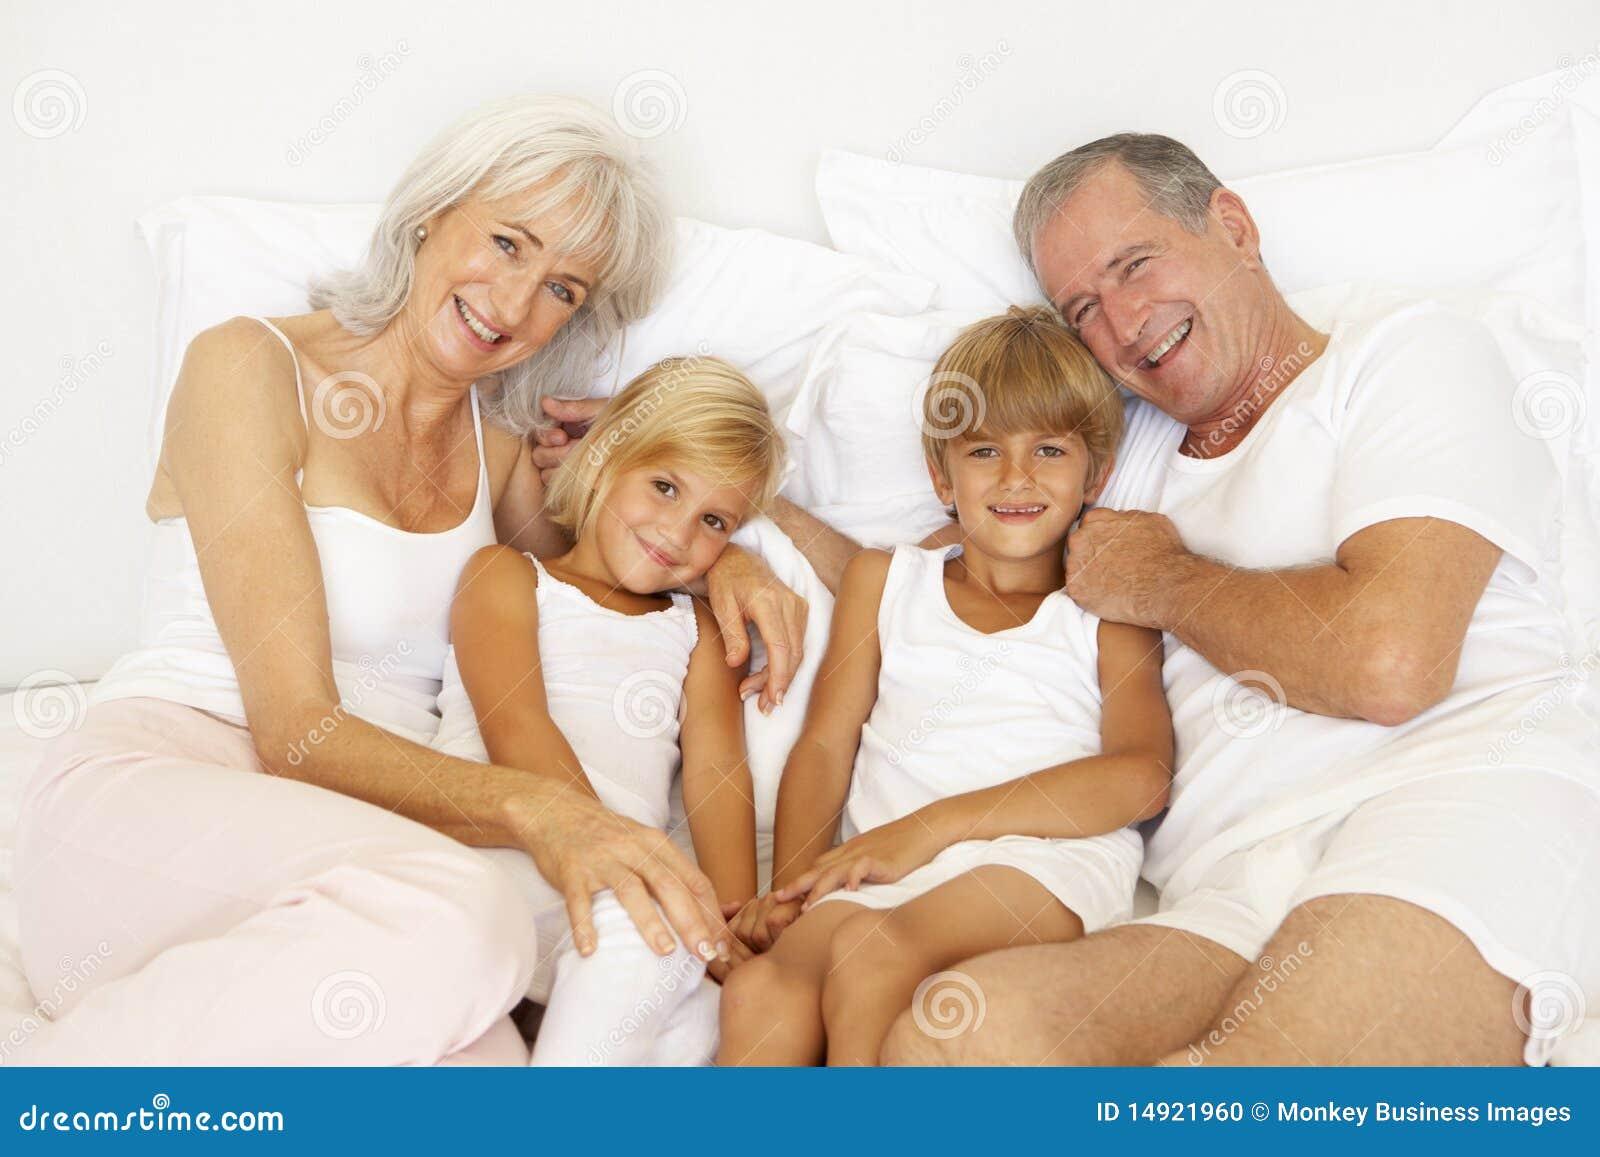 Як внук трахає бабушку 5 фотография